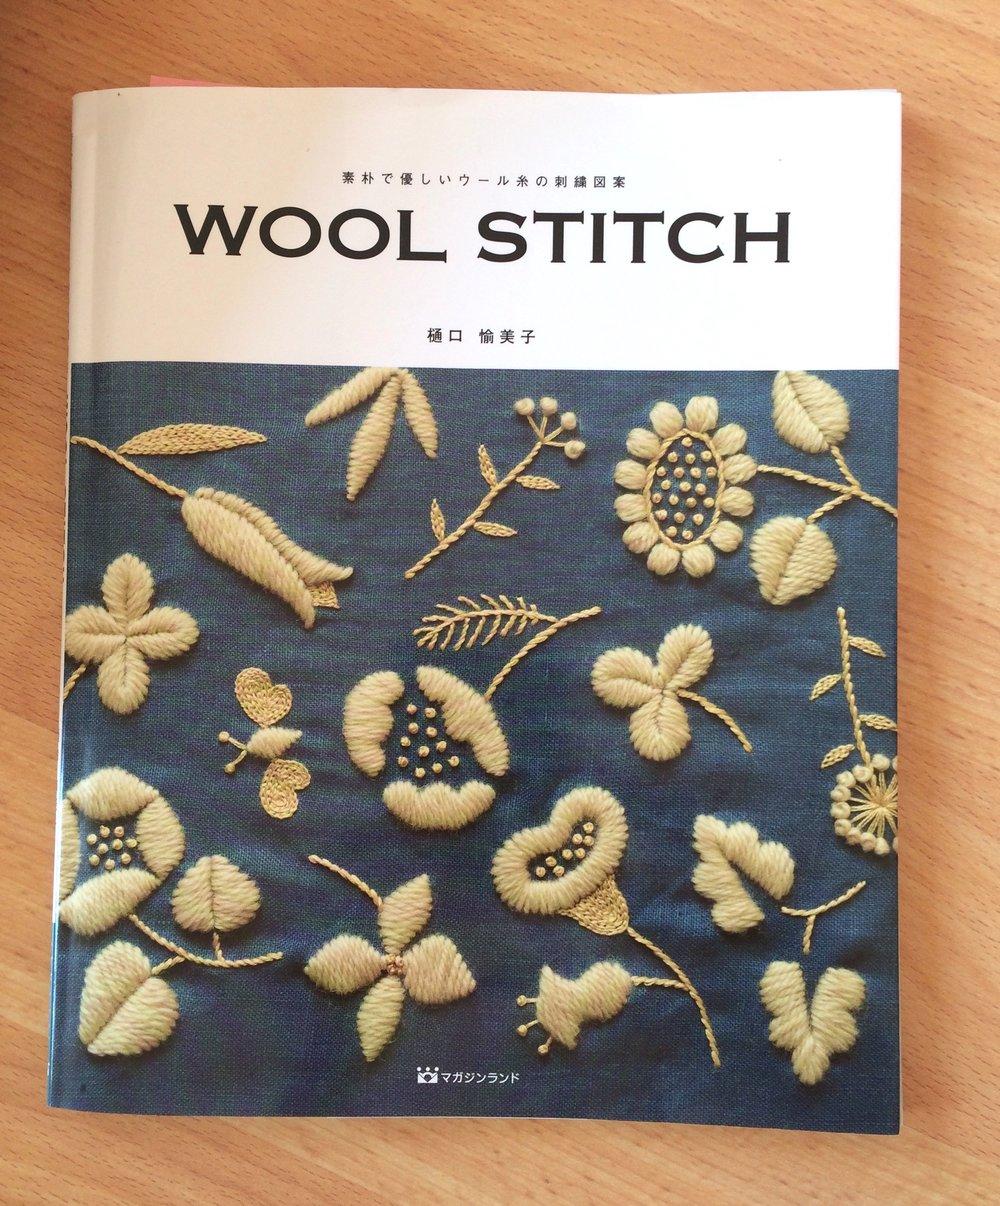 Wool Stitchembroidery book.jpg